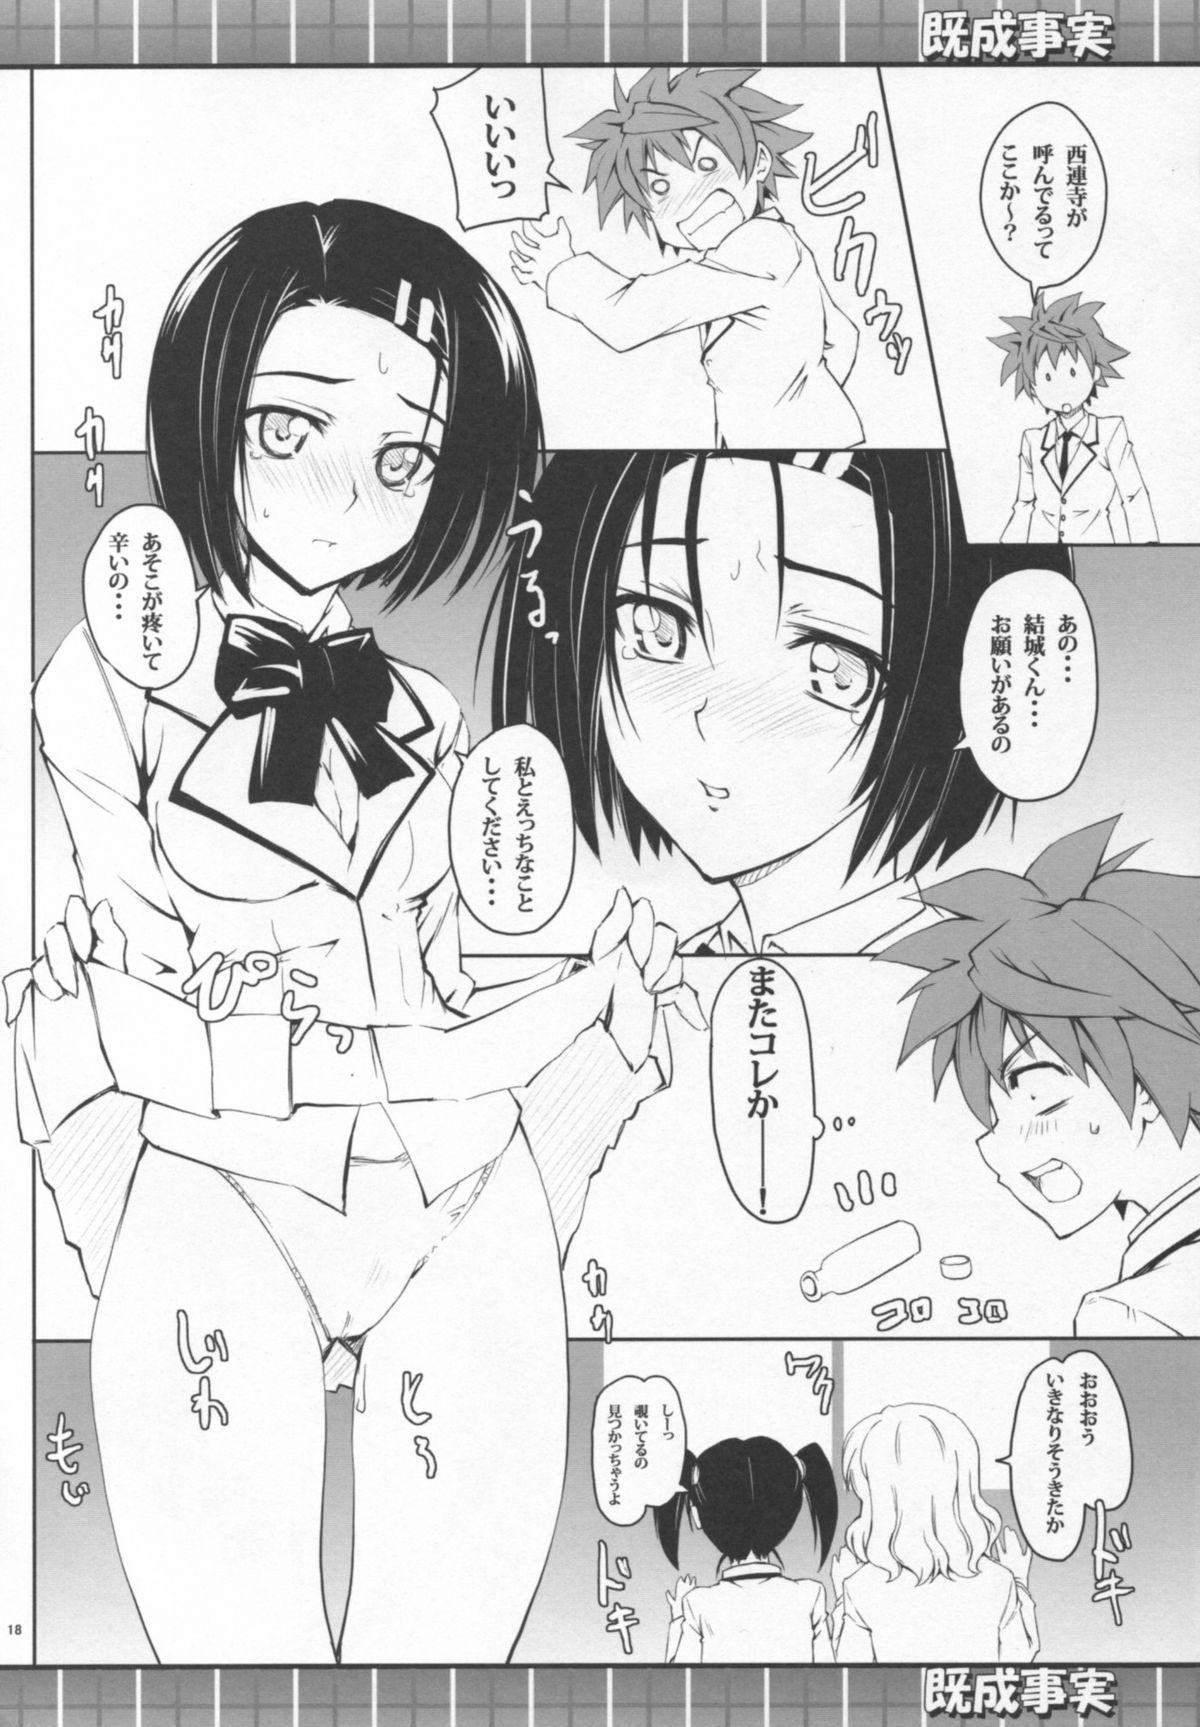 Kiseijijitsu 16